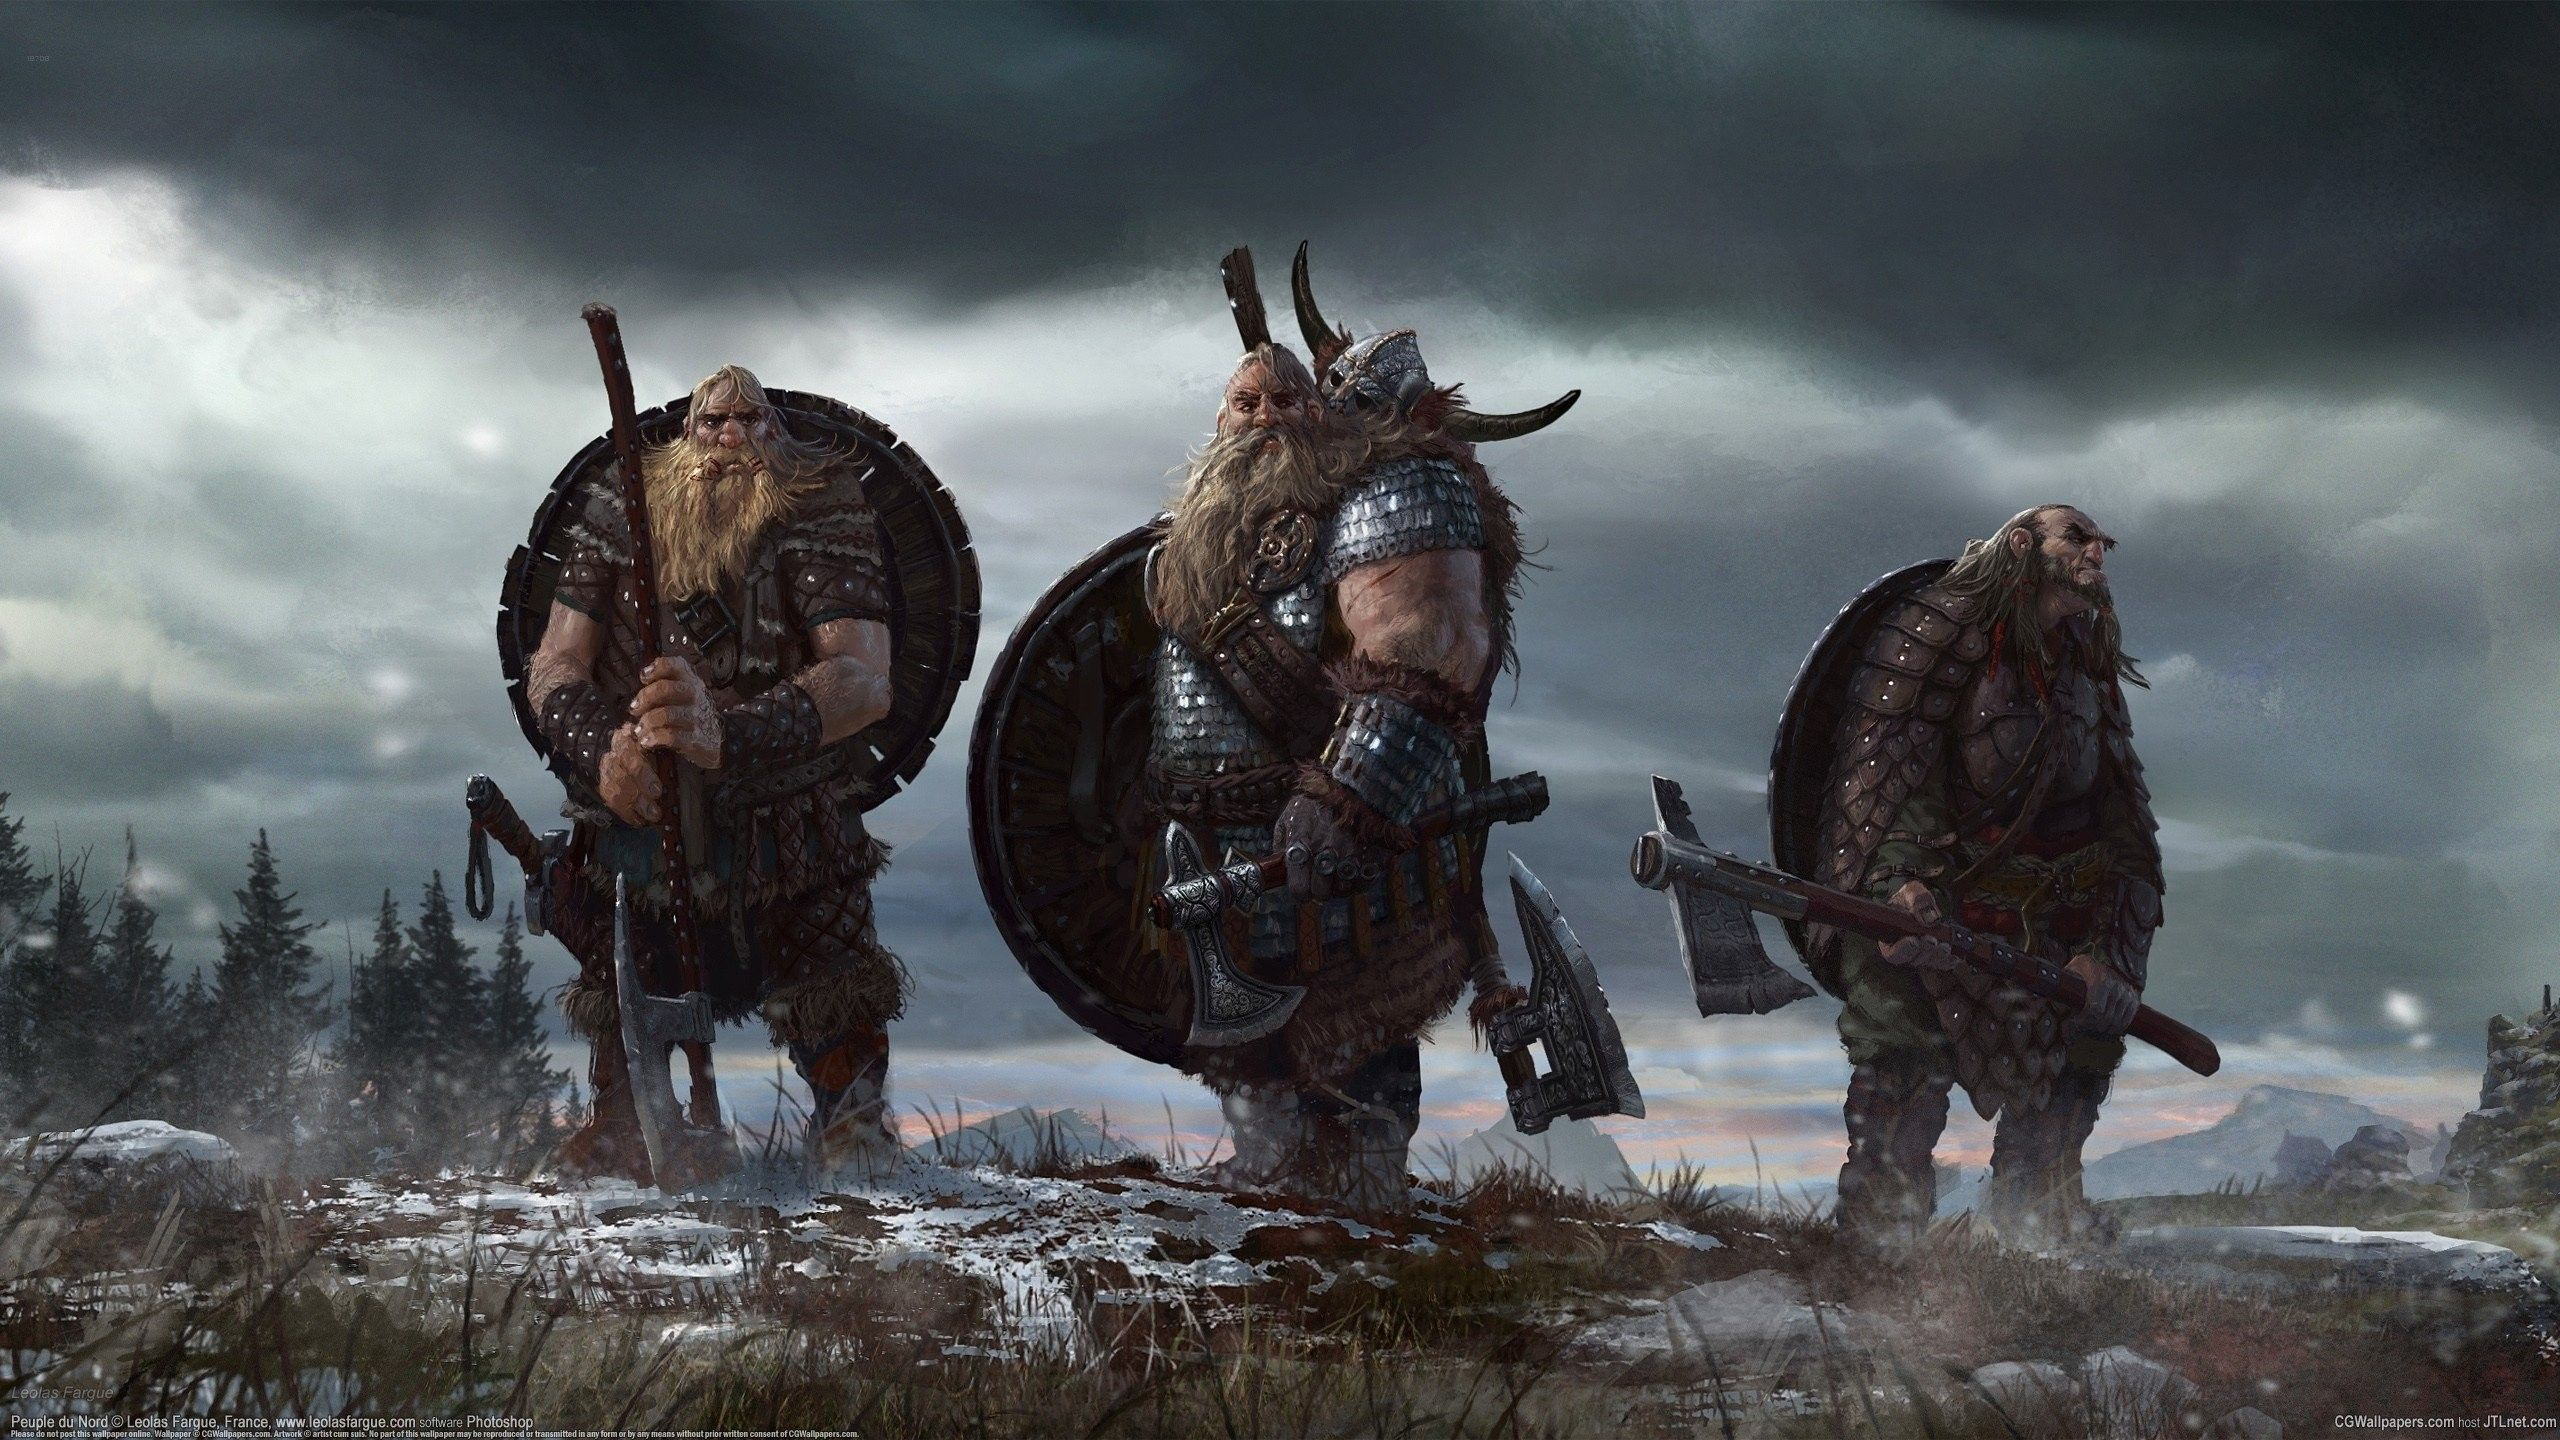 Viking Warrior Wallpapers Top Free Viking Warrior Backgrounds Wallpaperaccess